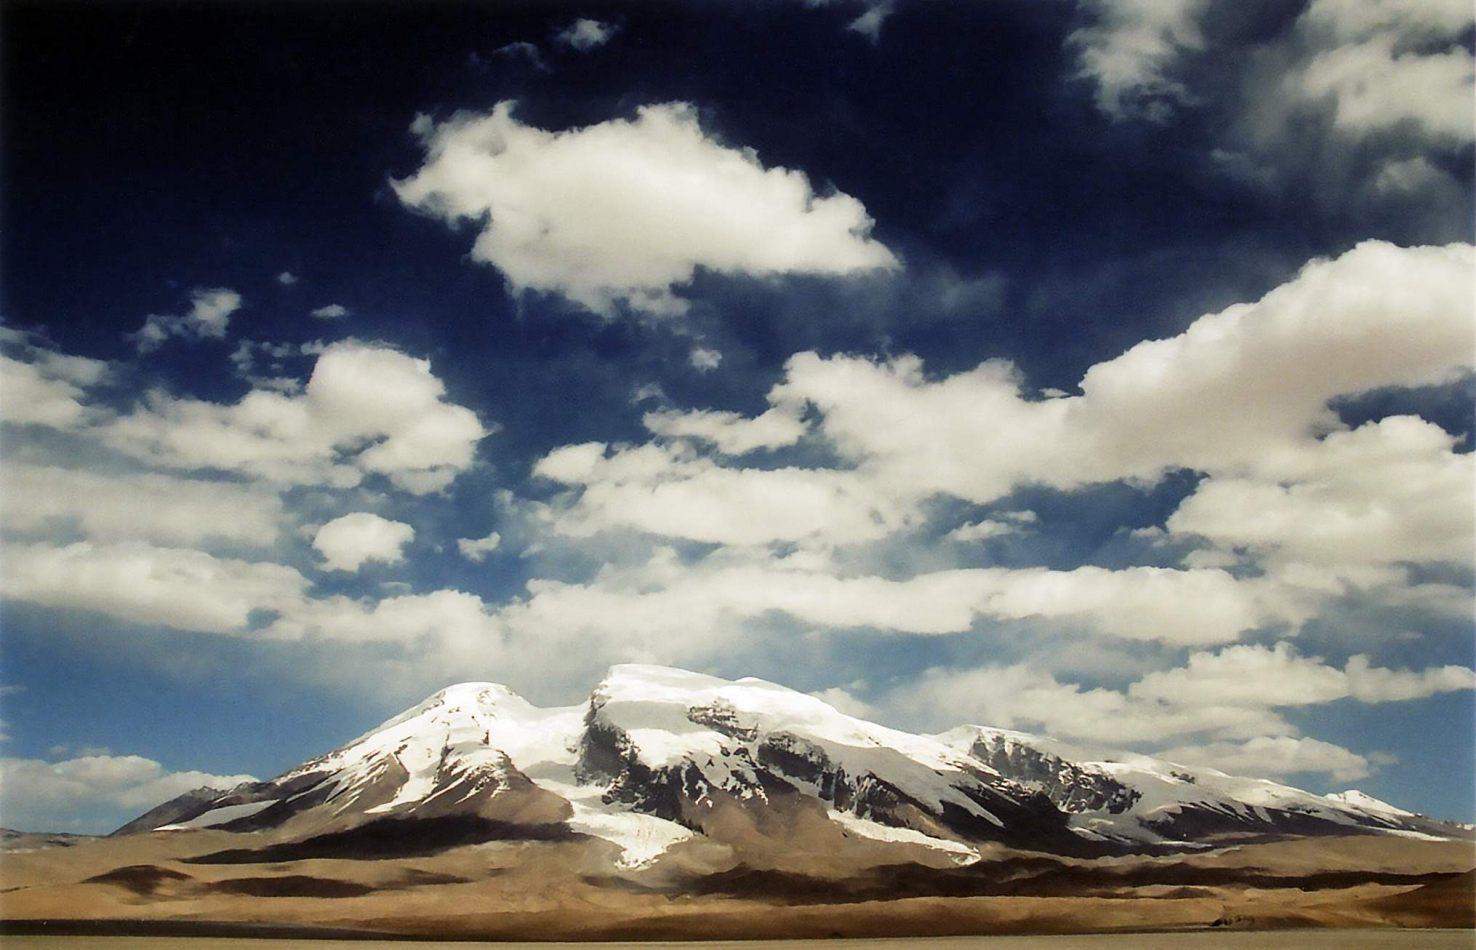 Anthony Ellis Photography: Tall Walls - Muztagh Ata